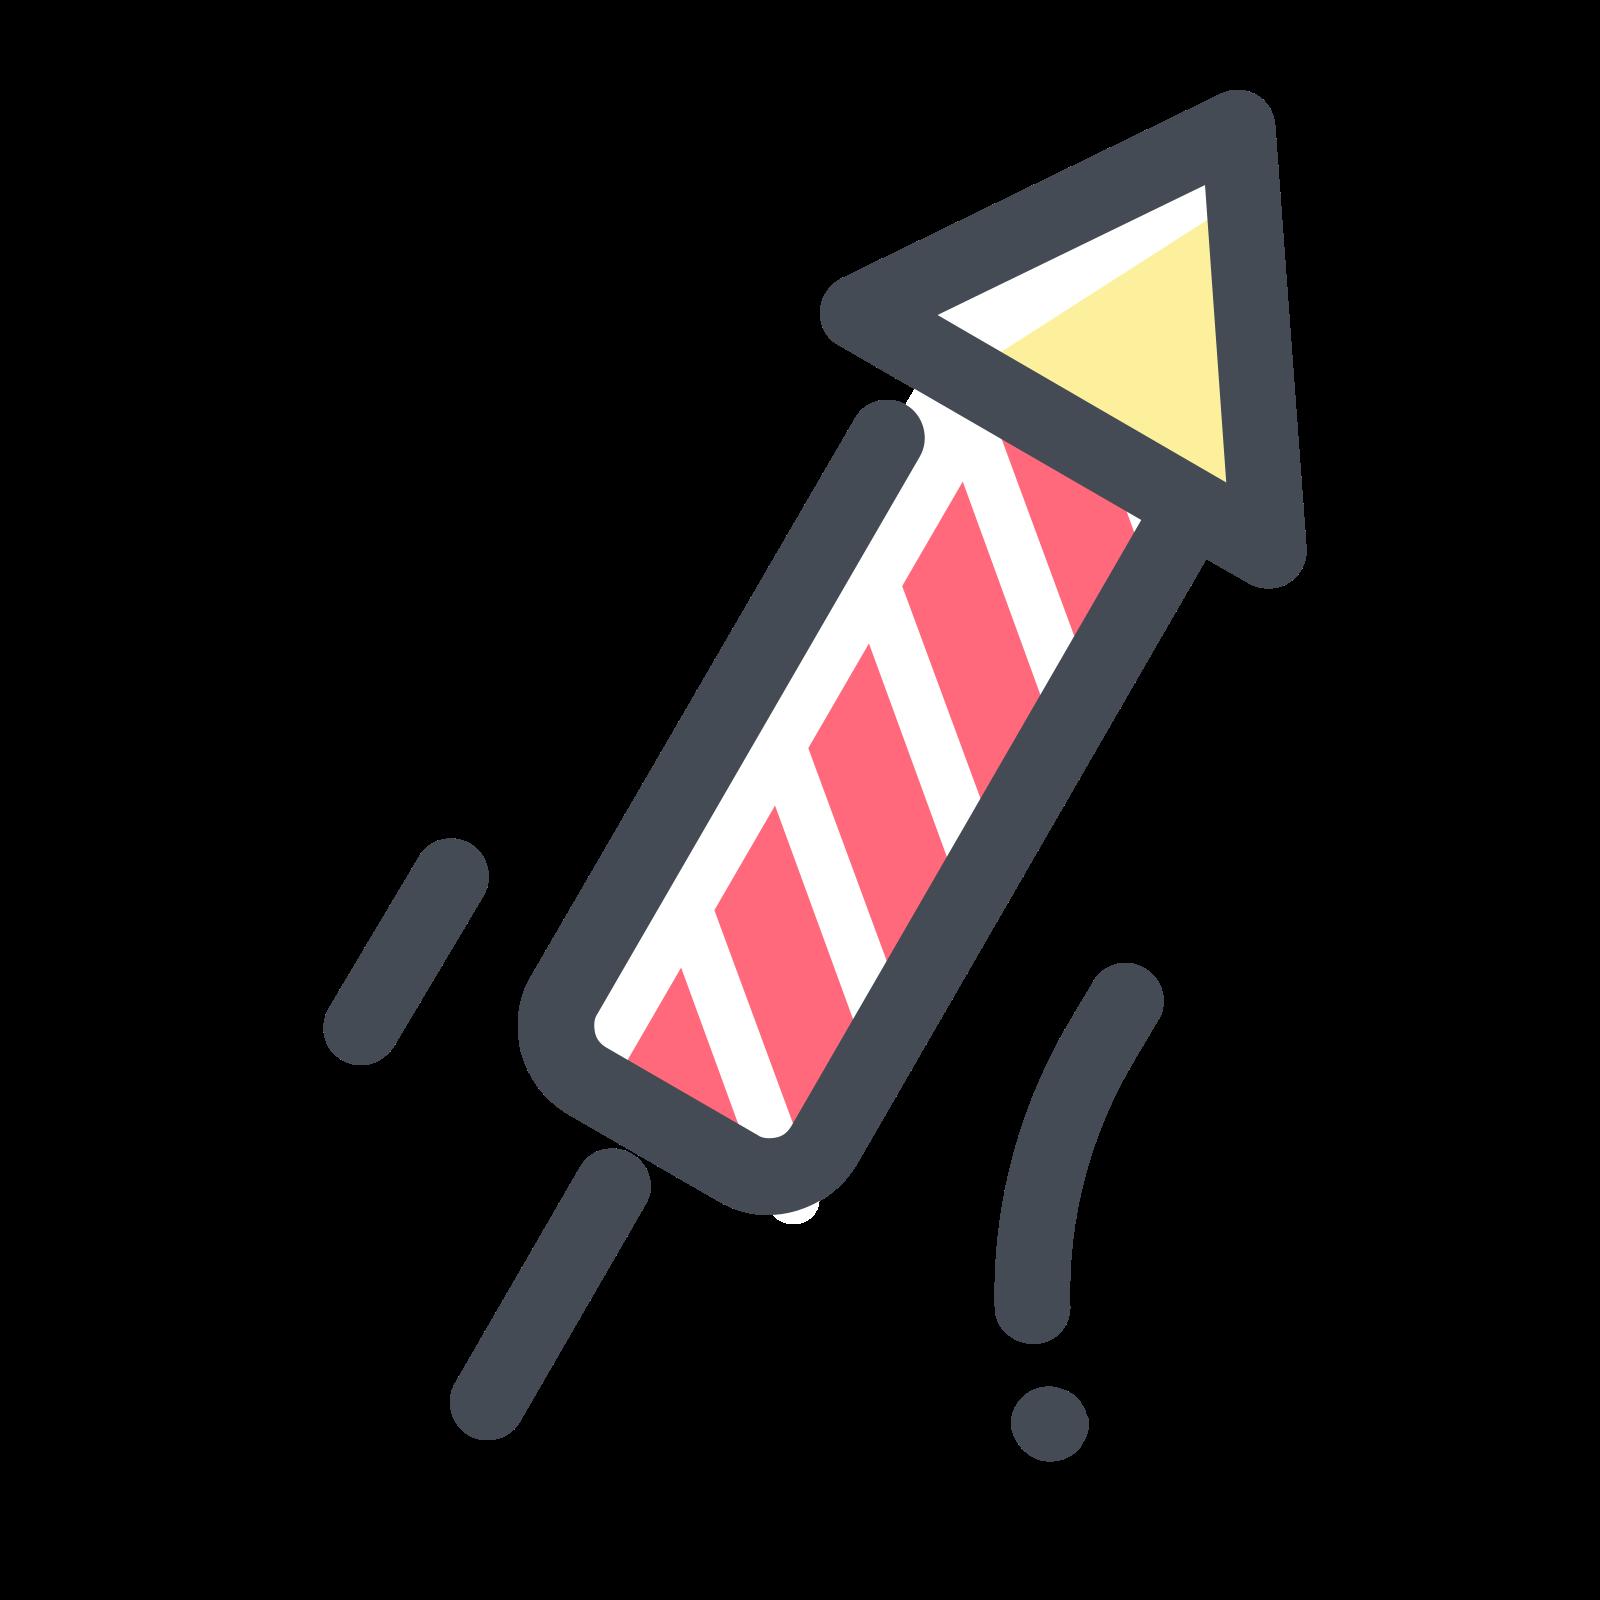 Fajerwerk icon